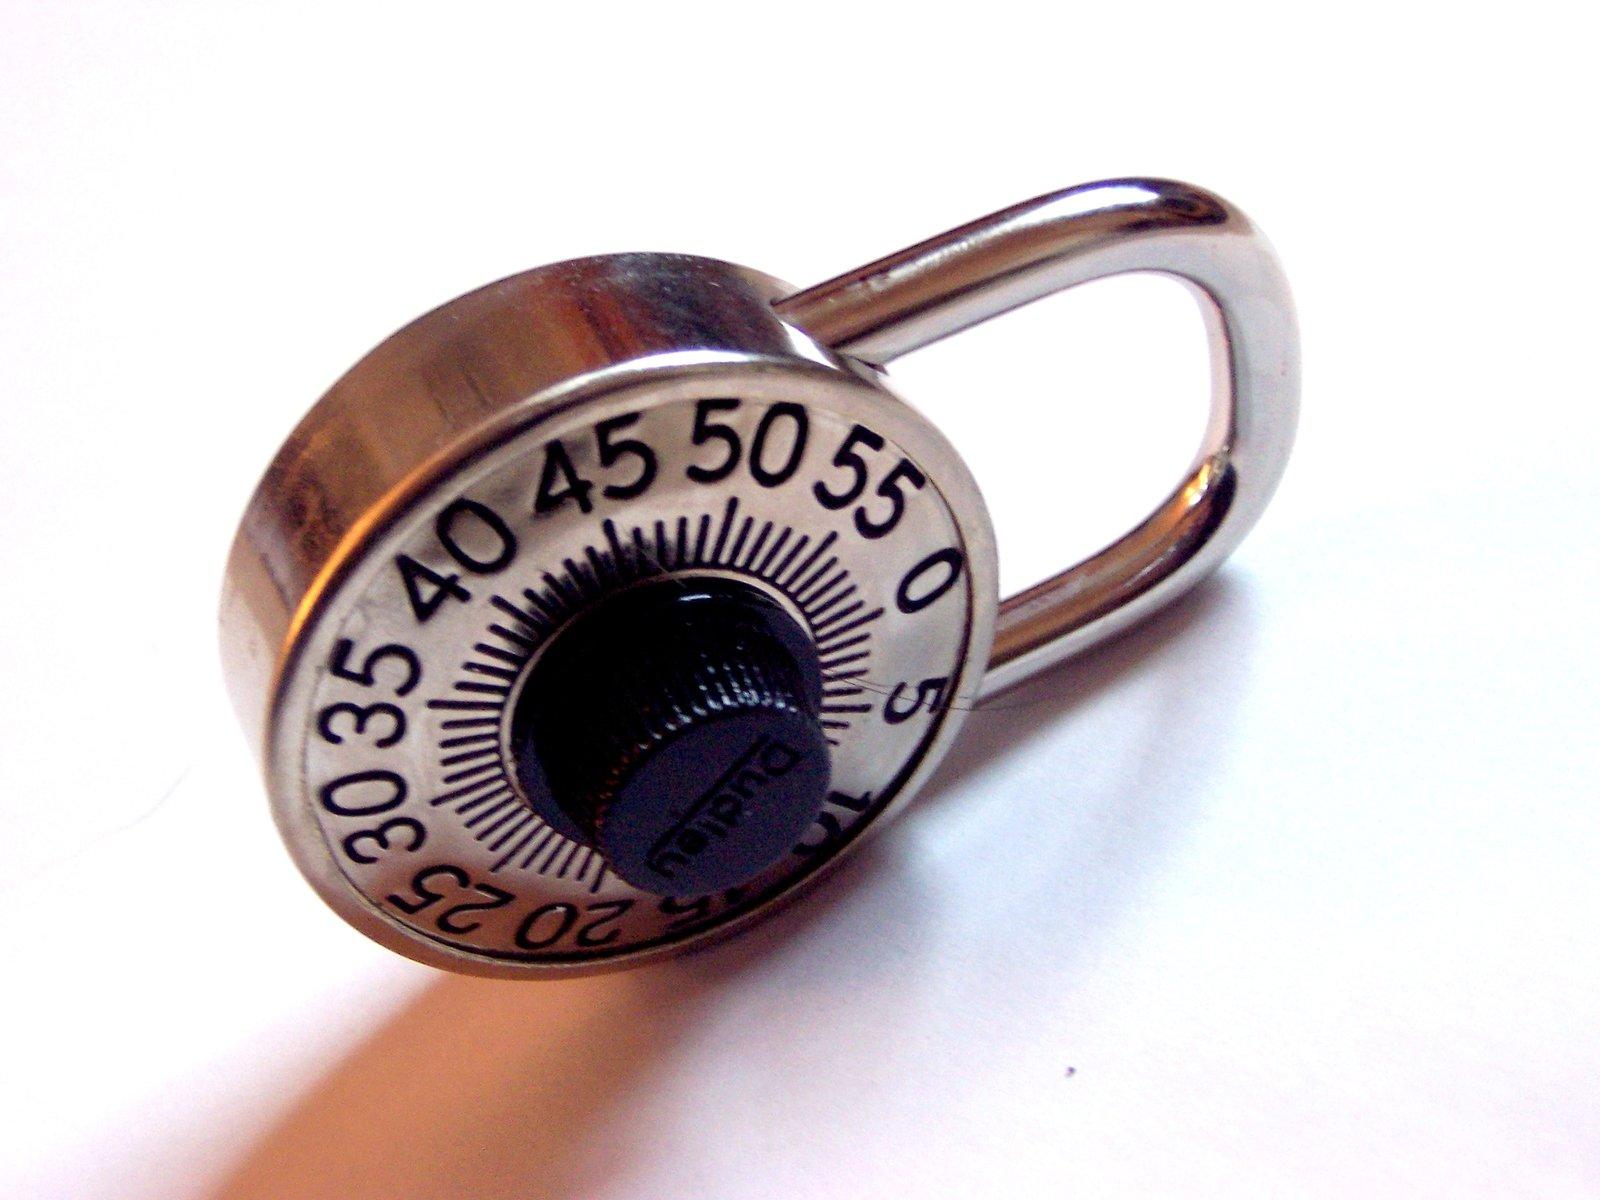 A combination lock